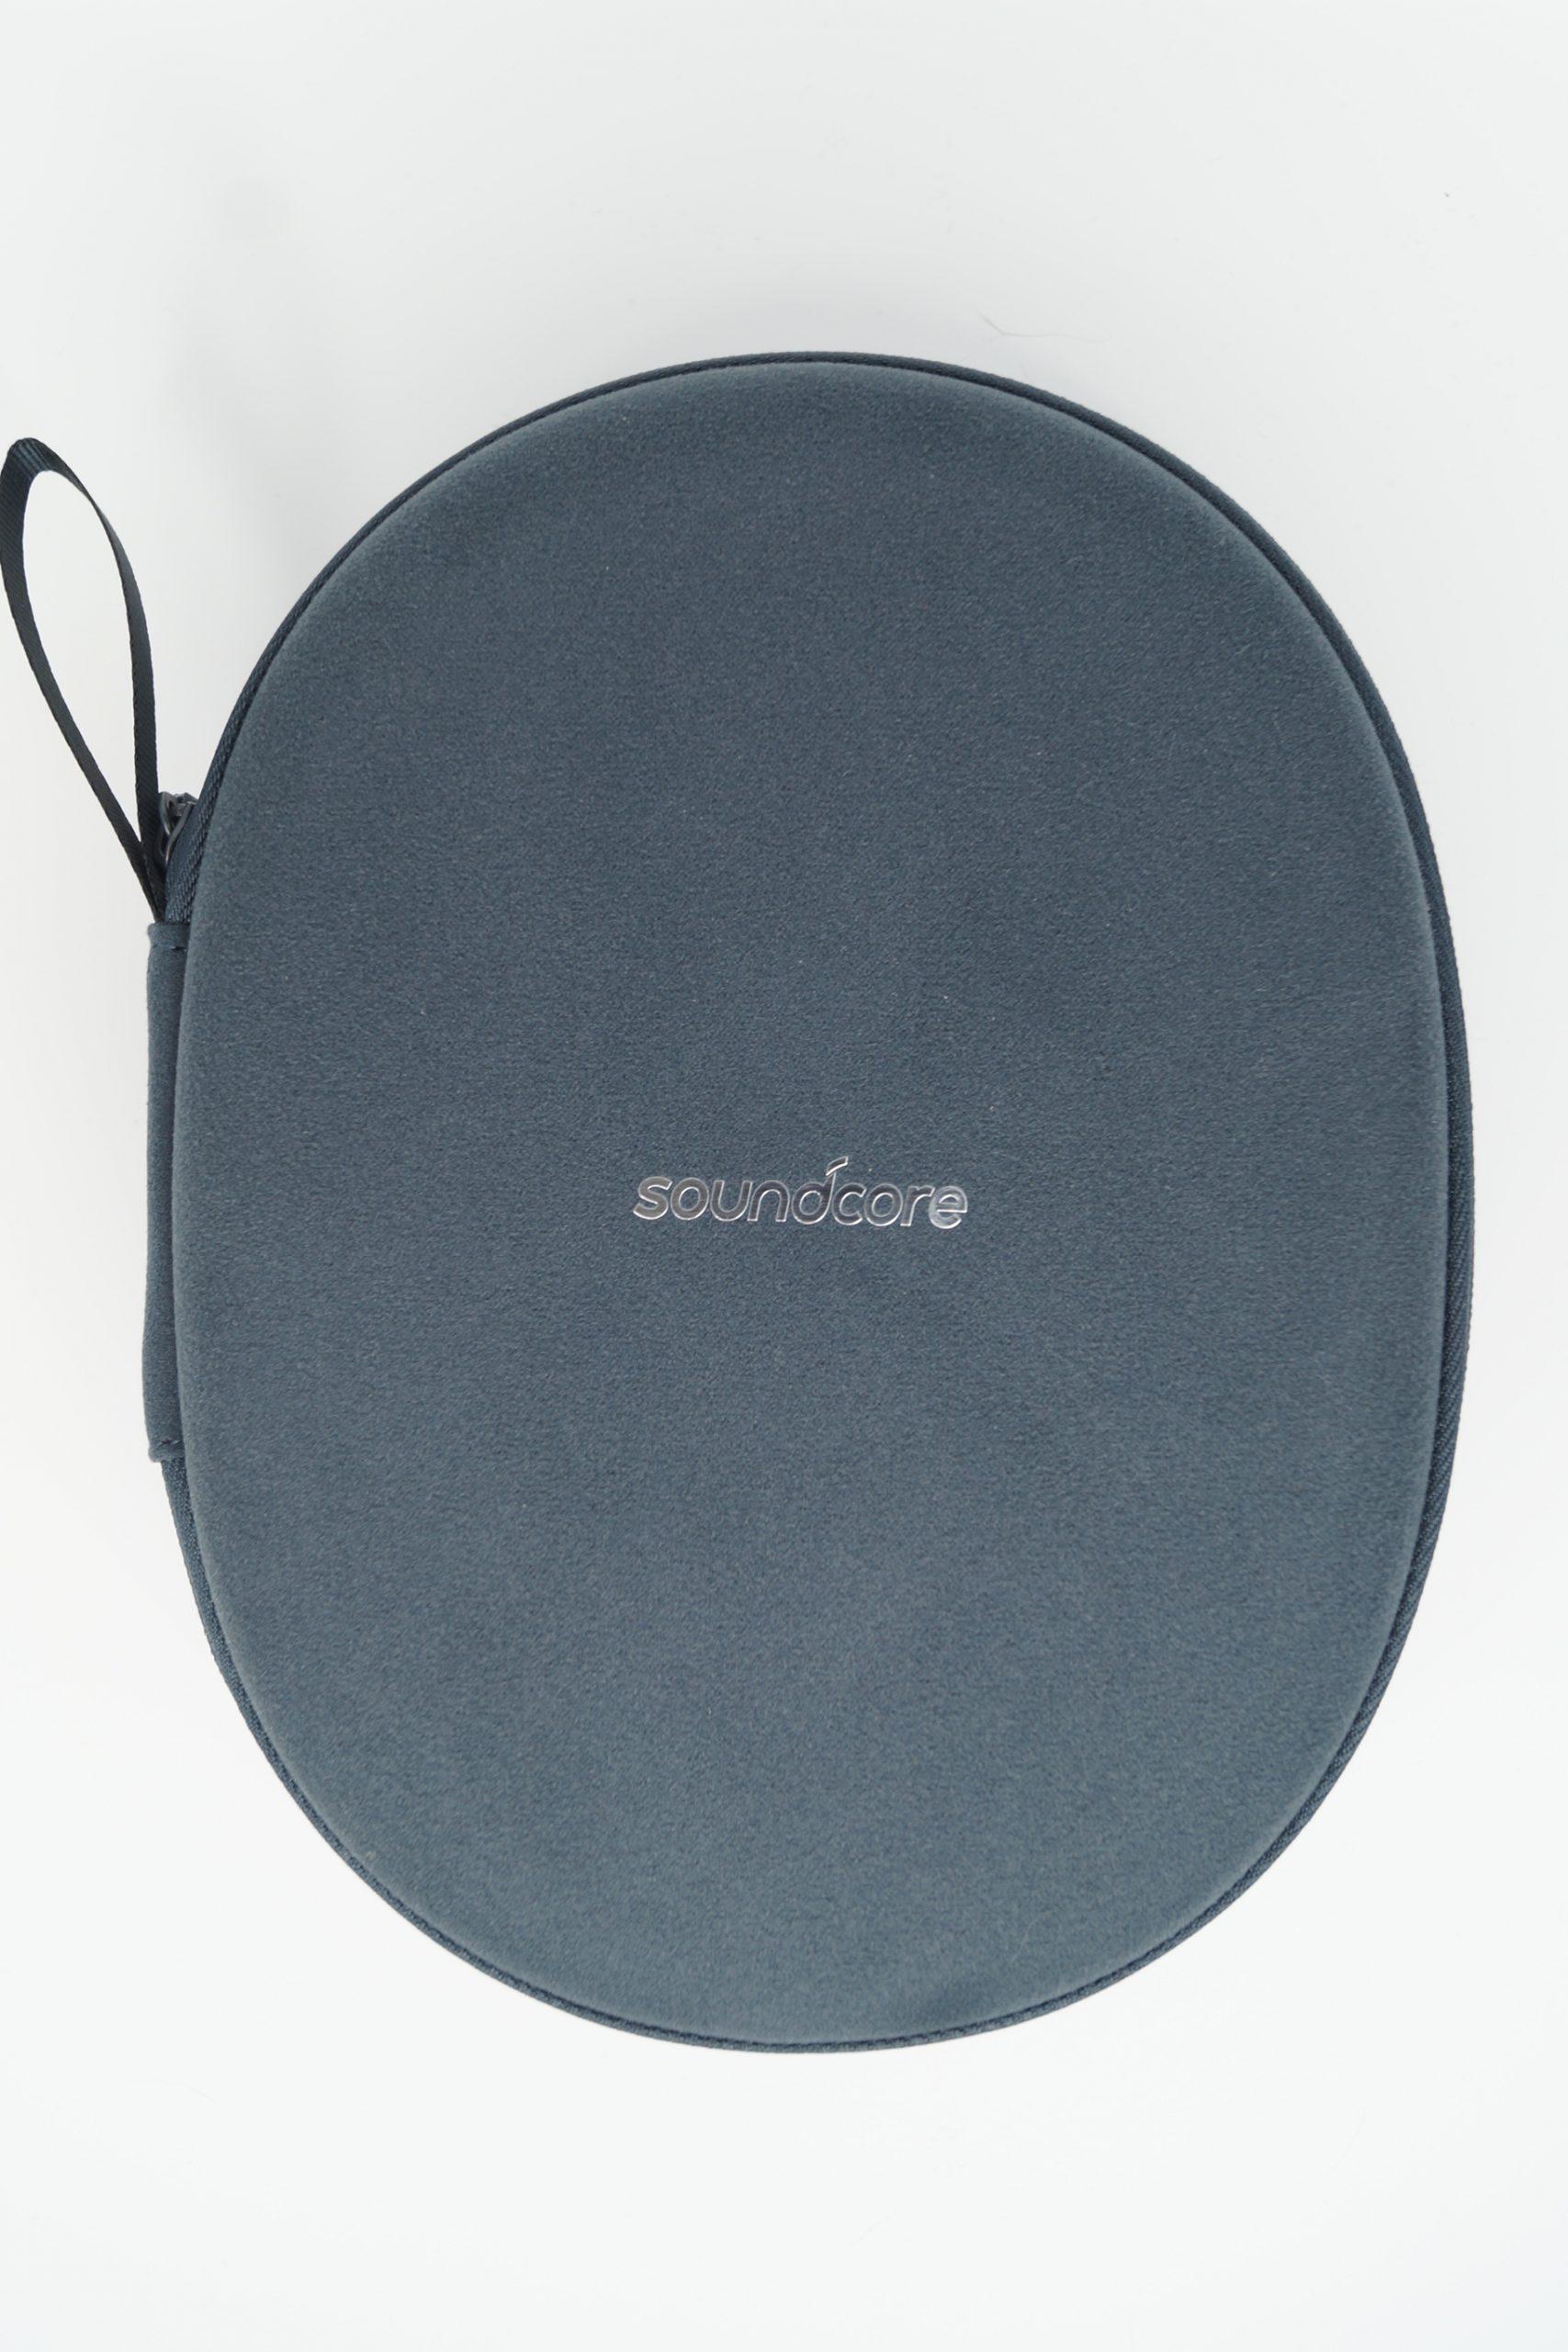 Soundcore Life Q35 Tasche